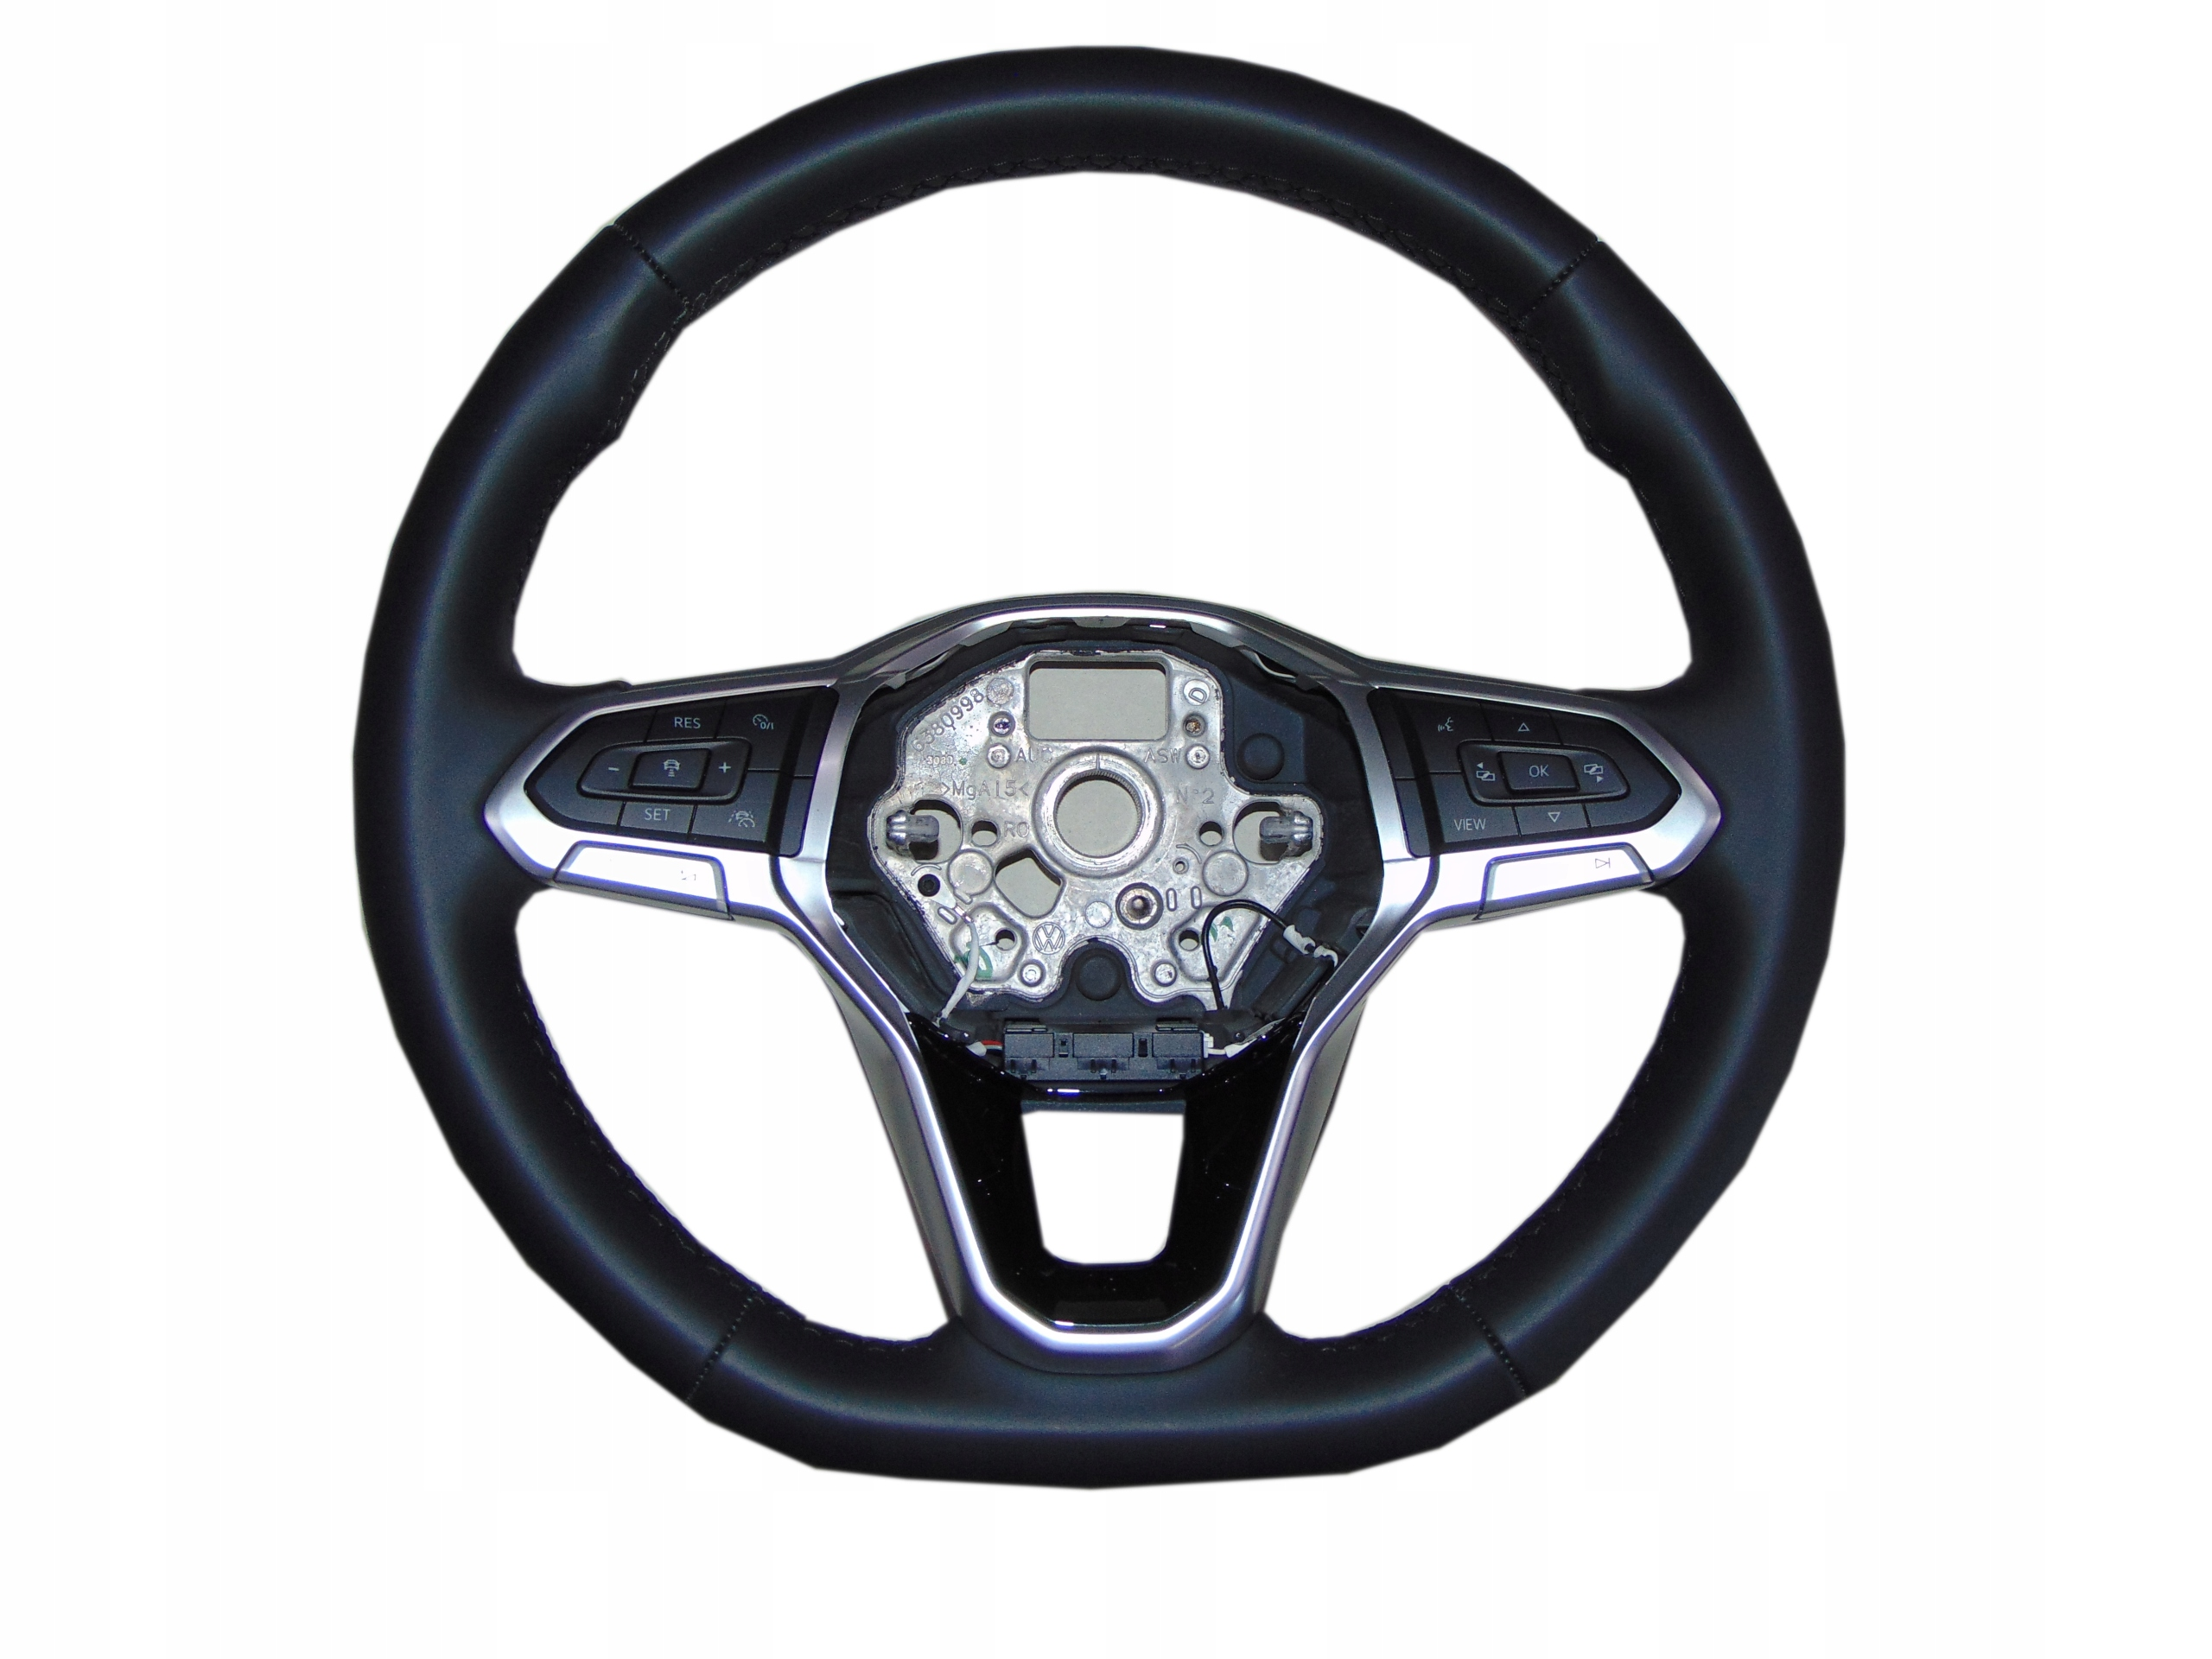 VW PASSAT B8 LIFT KIEROWNICA MULTI 3G0419089AH 9805980157 - Allegro.pl